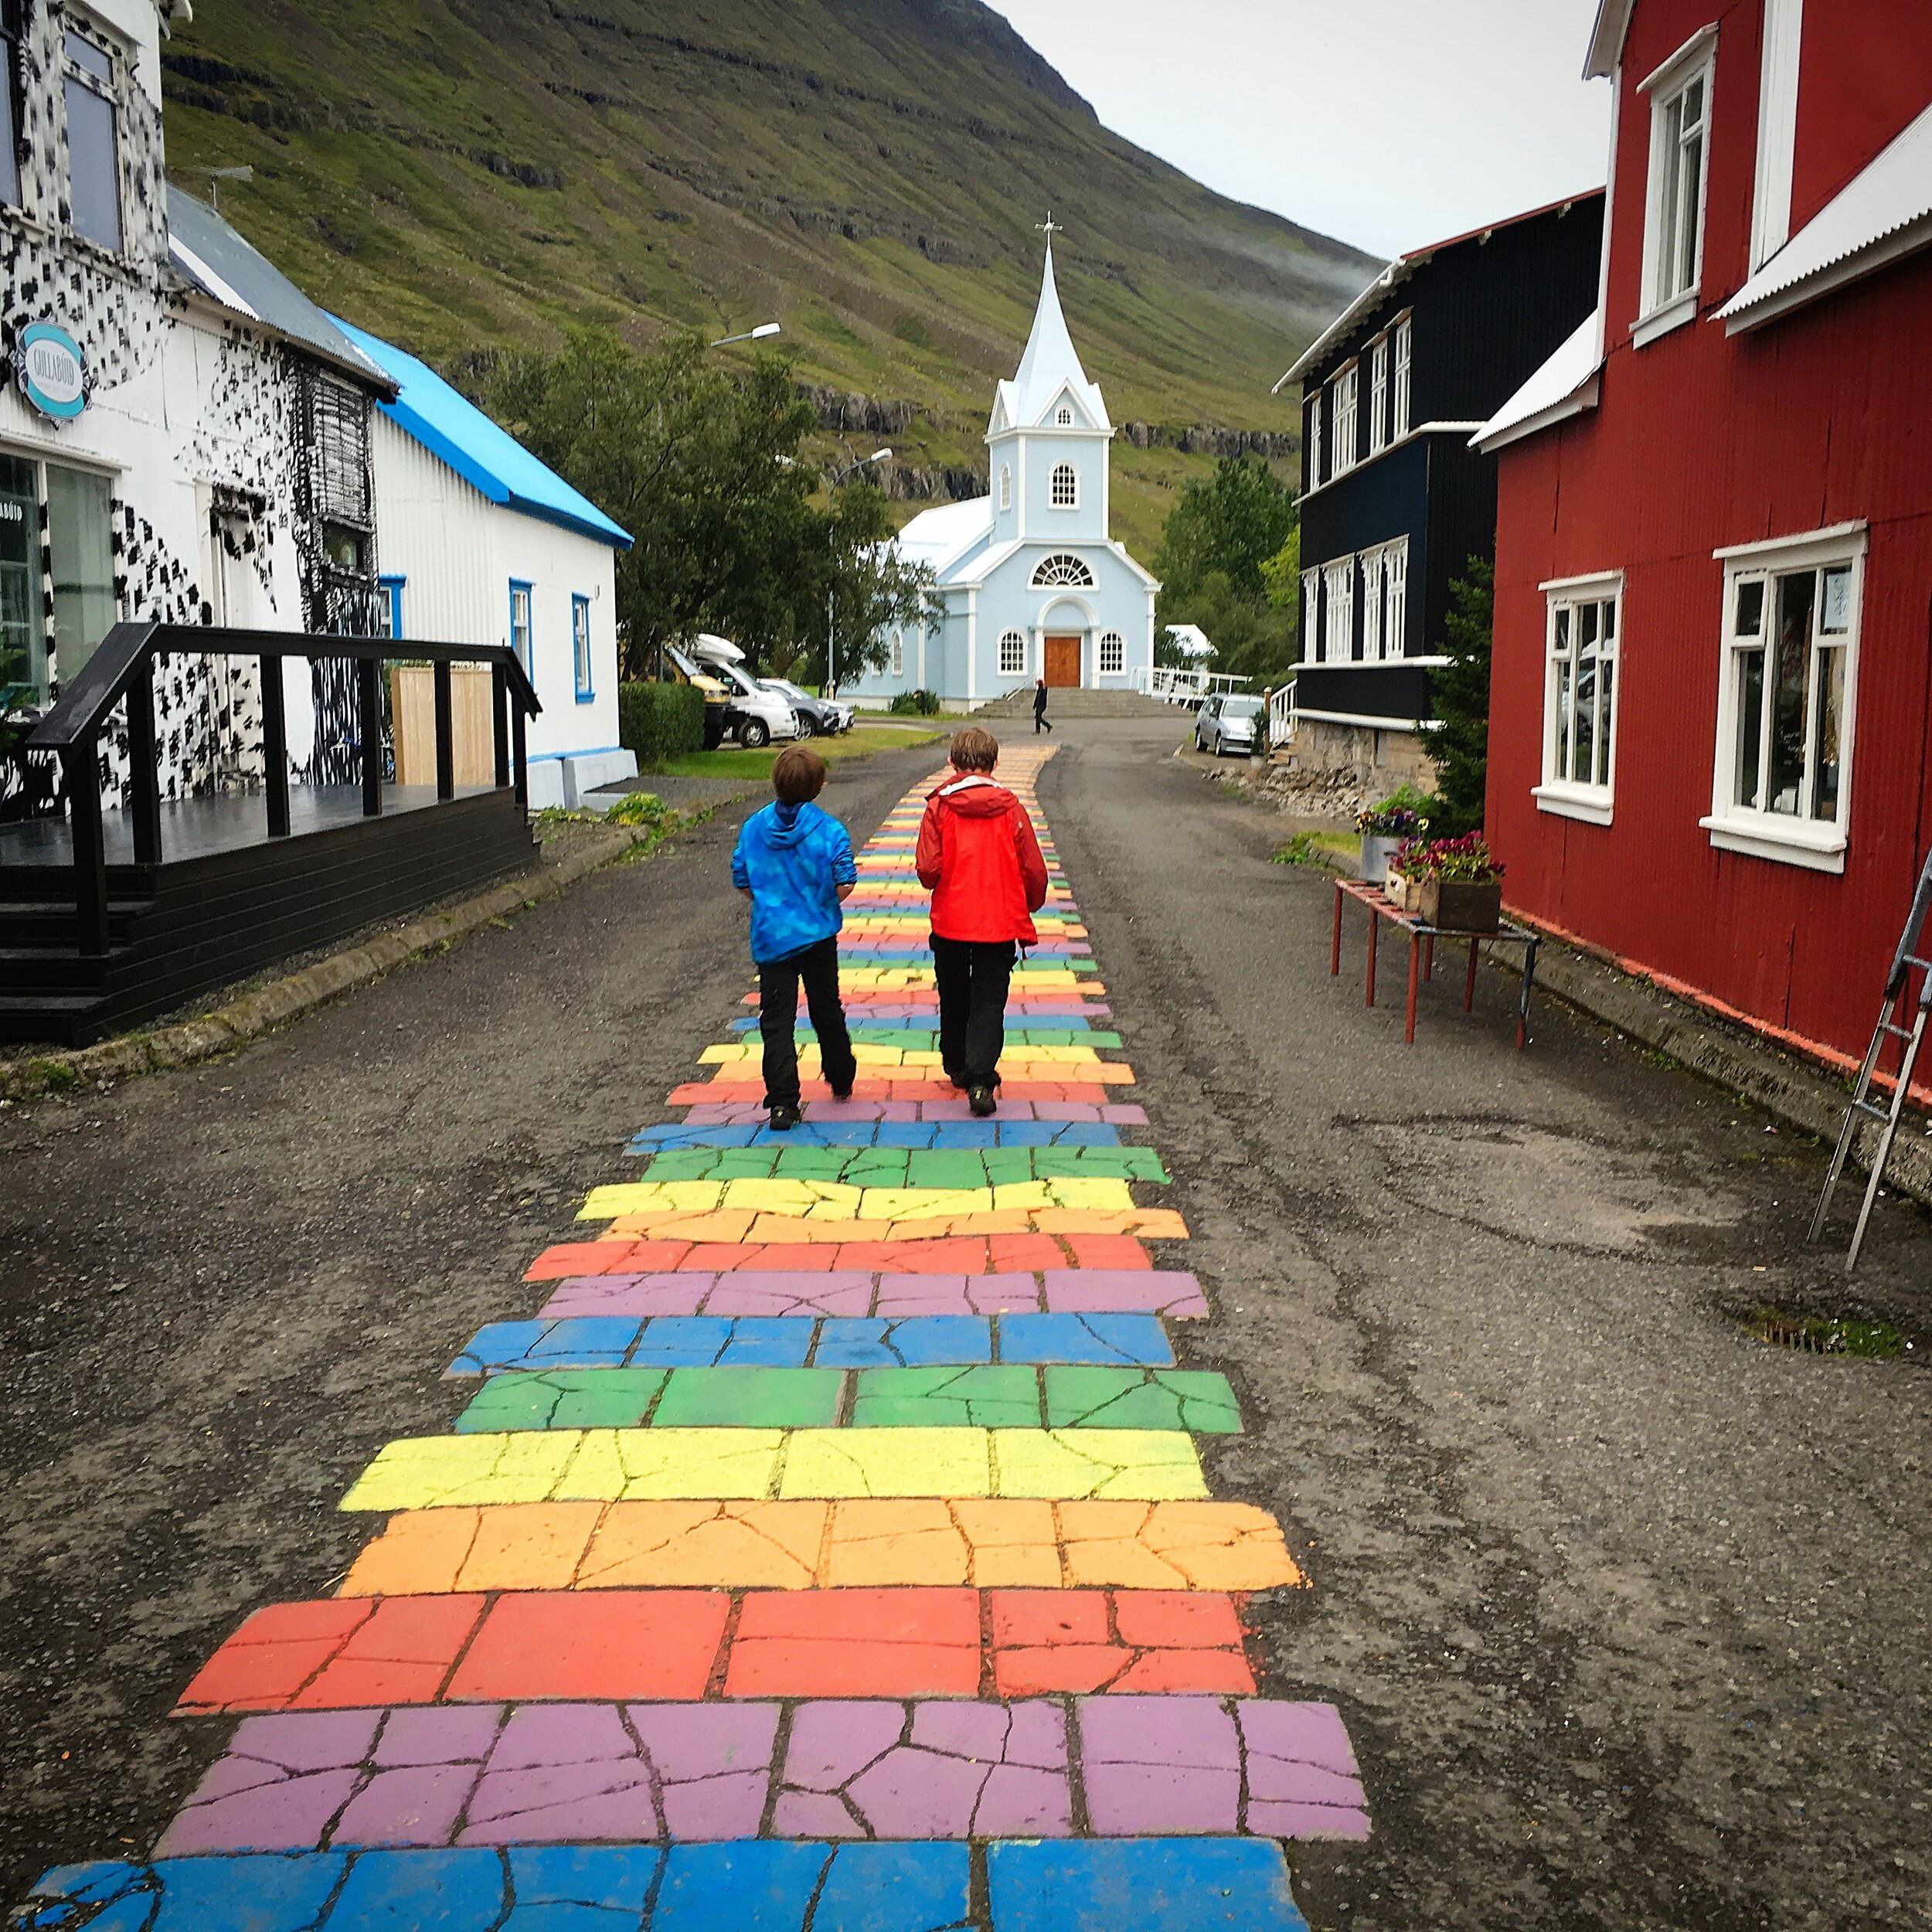 Follow the rainbow-brick road.  Photo by Michael Mundt.